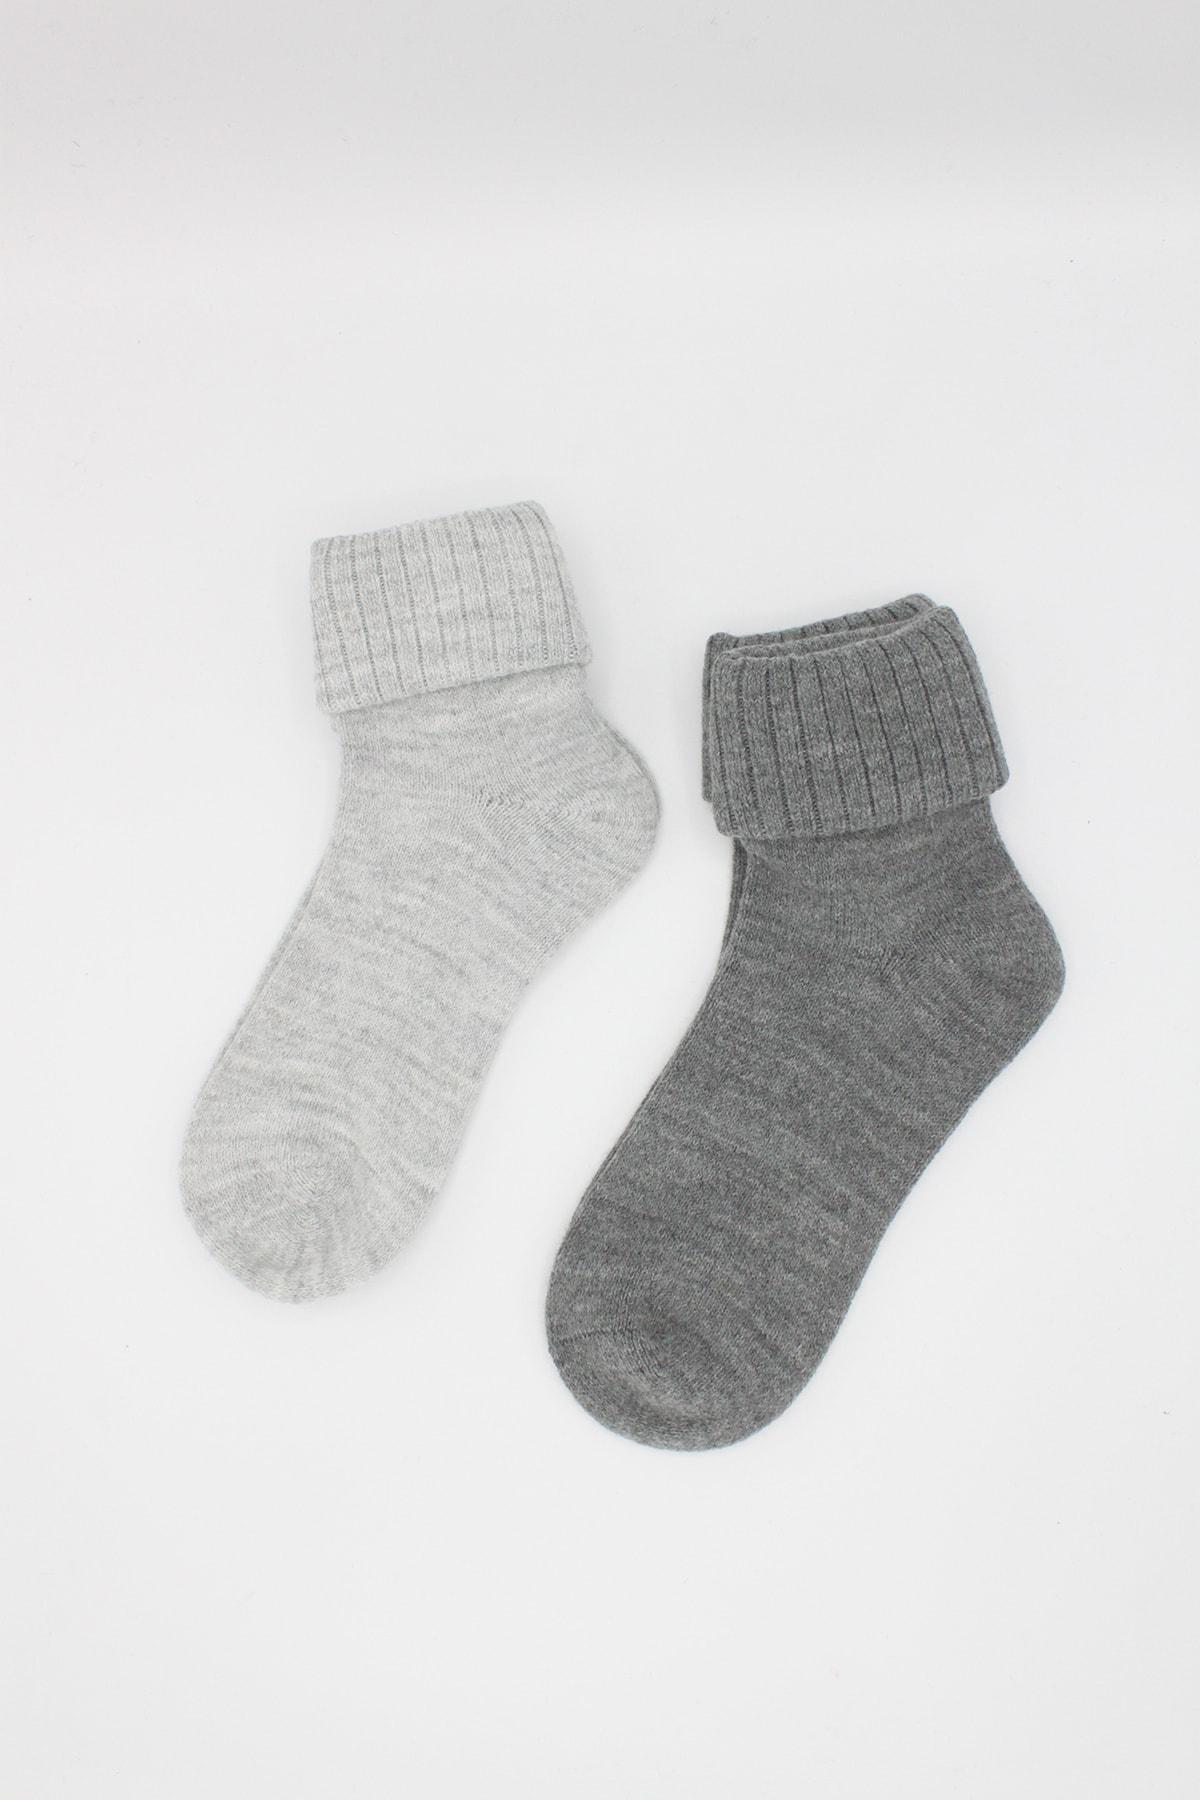 Igloo Socks Igloo 2'li Kıvrık Dikişsiz Yün Çorabı 1